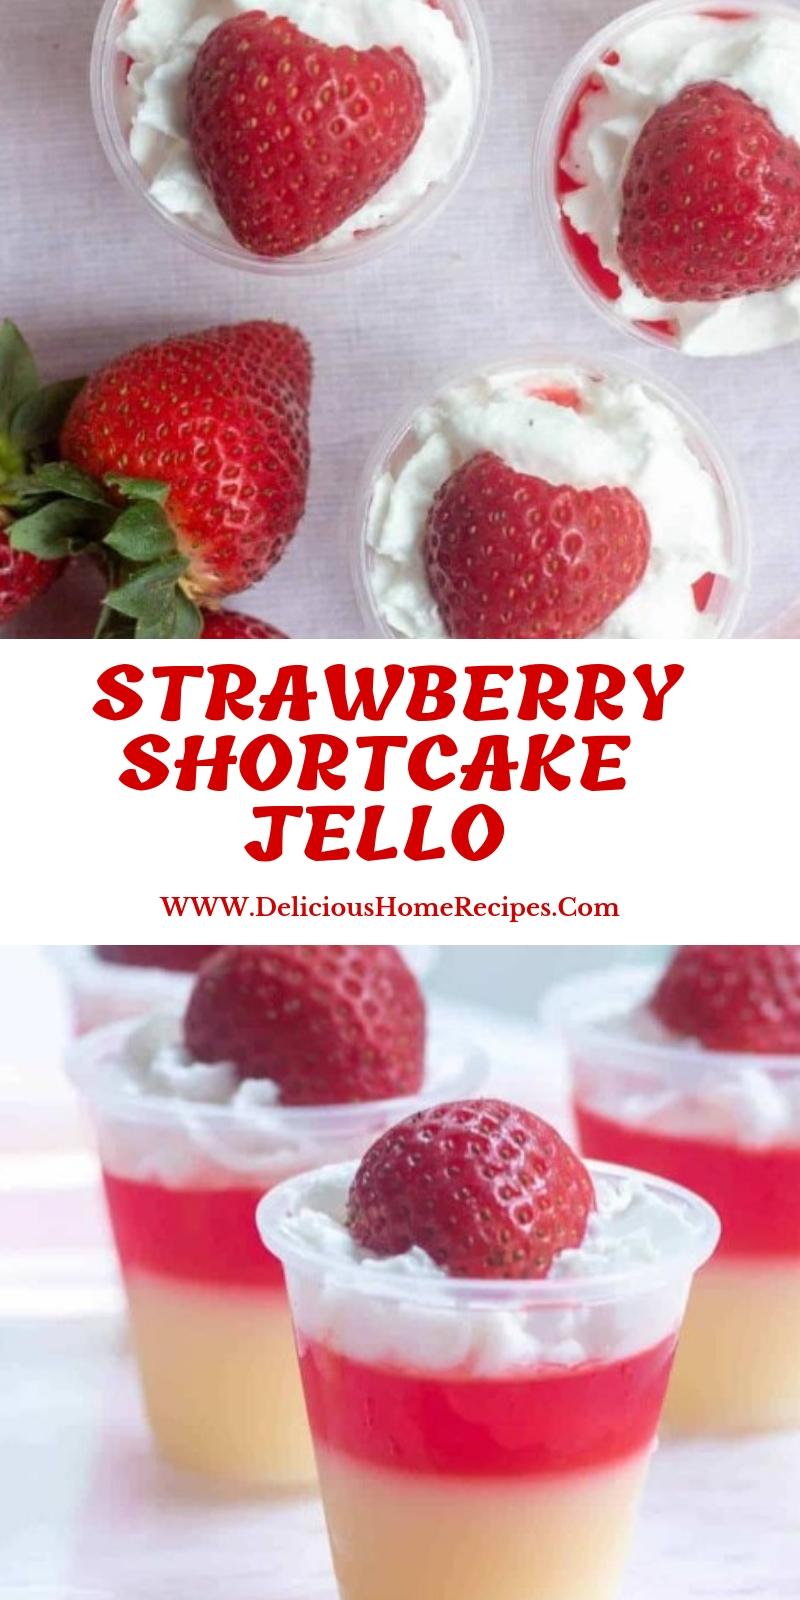 Strawberry Shortcake Jello #christmas #dessert